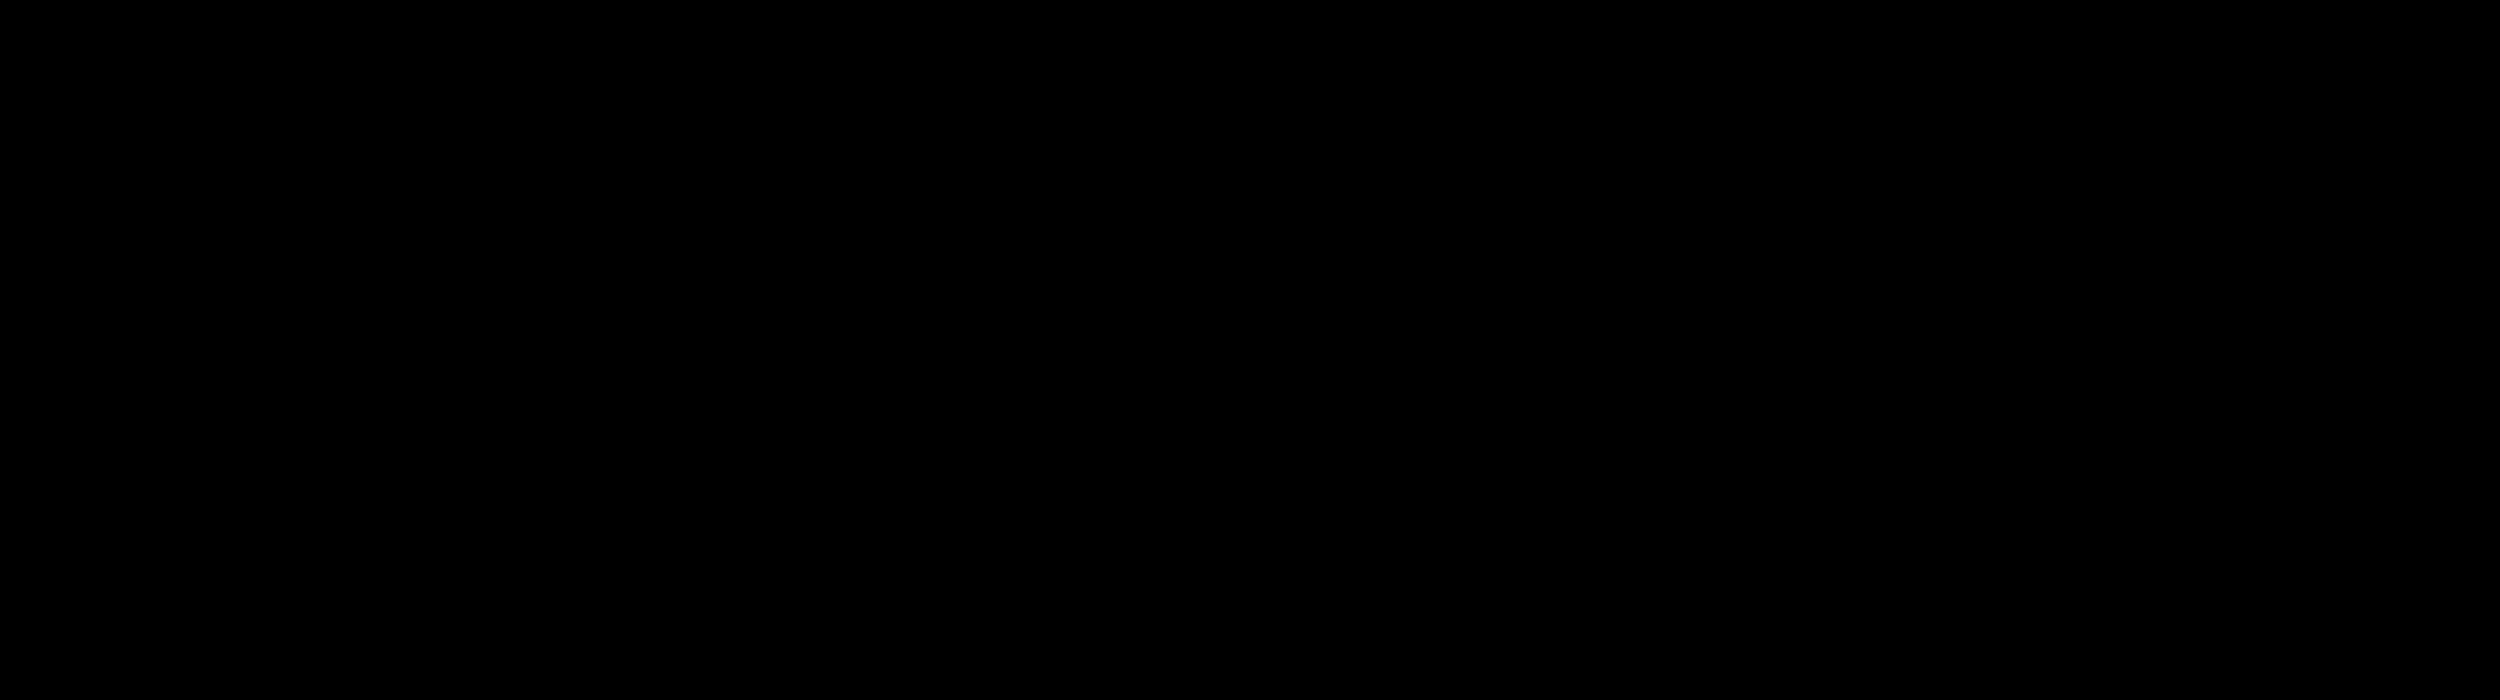 Lavazza_logo_black.png